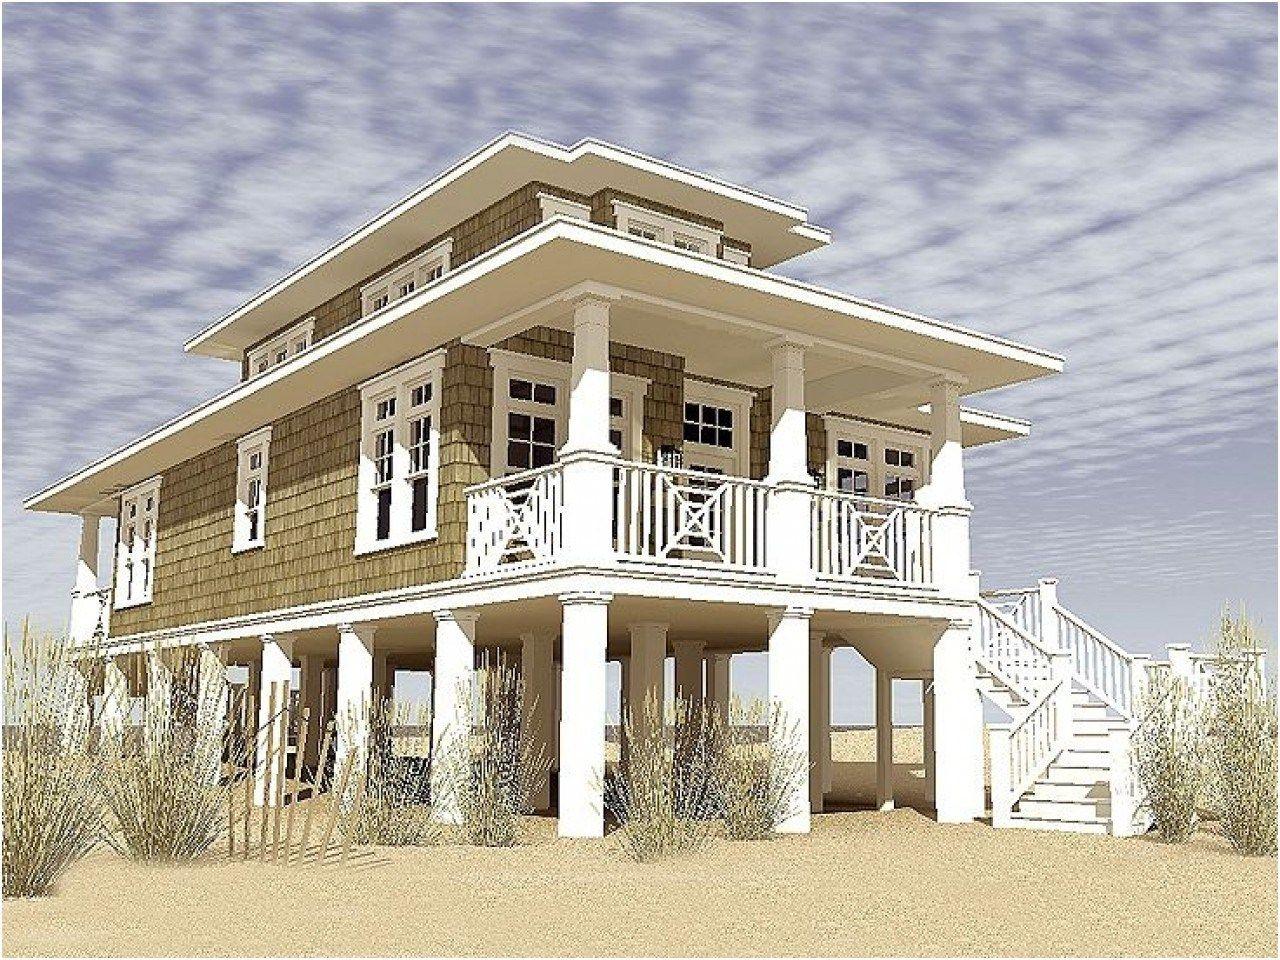 Narrow Beach House Designs Narrow Lot Beach House Plans From Beach House Plans Modern Beach House Small Beach Houses Coastal House Plans